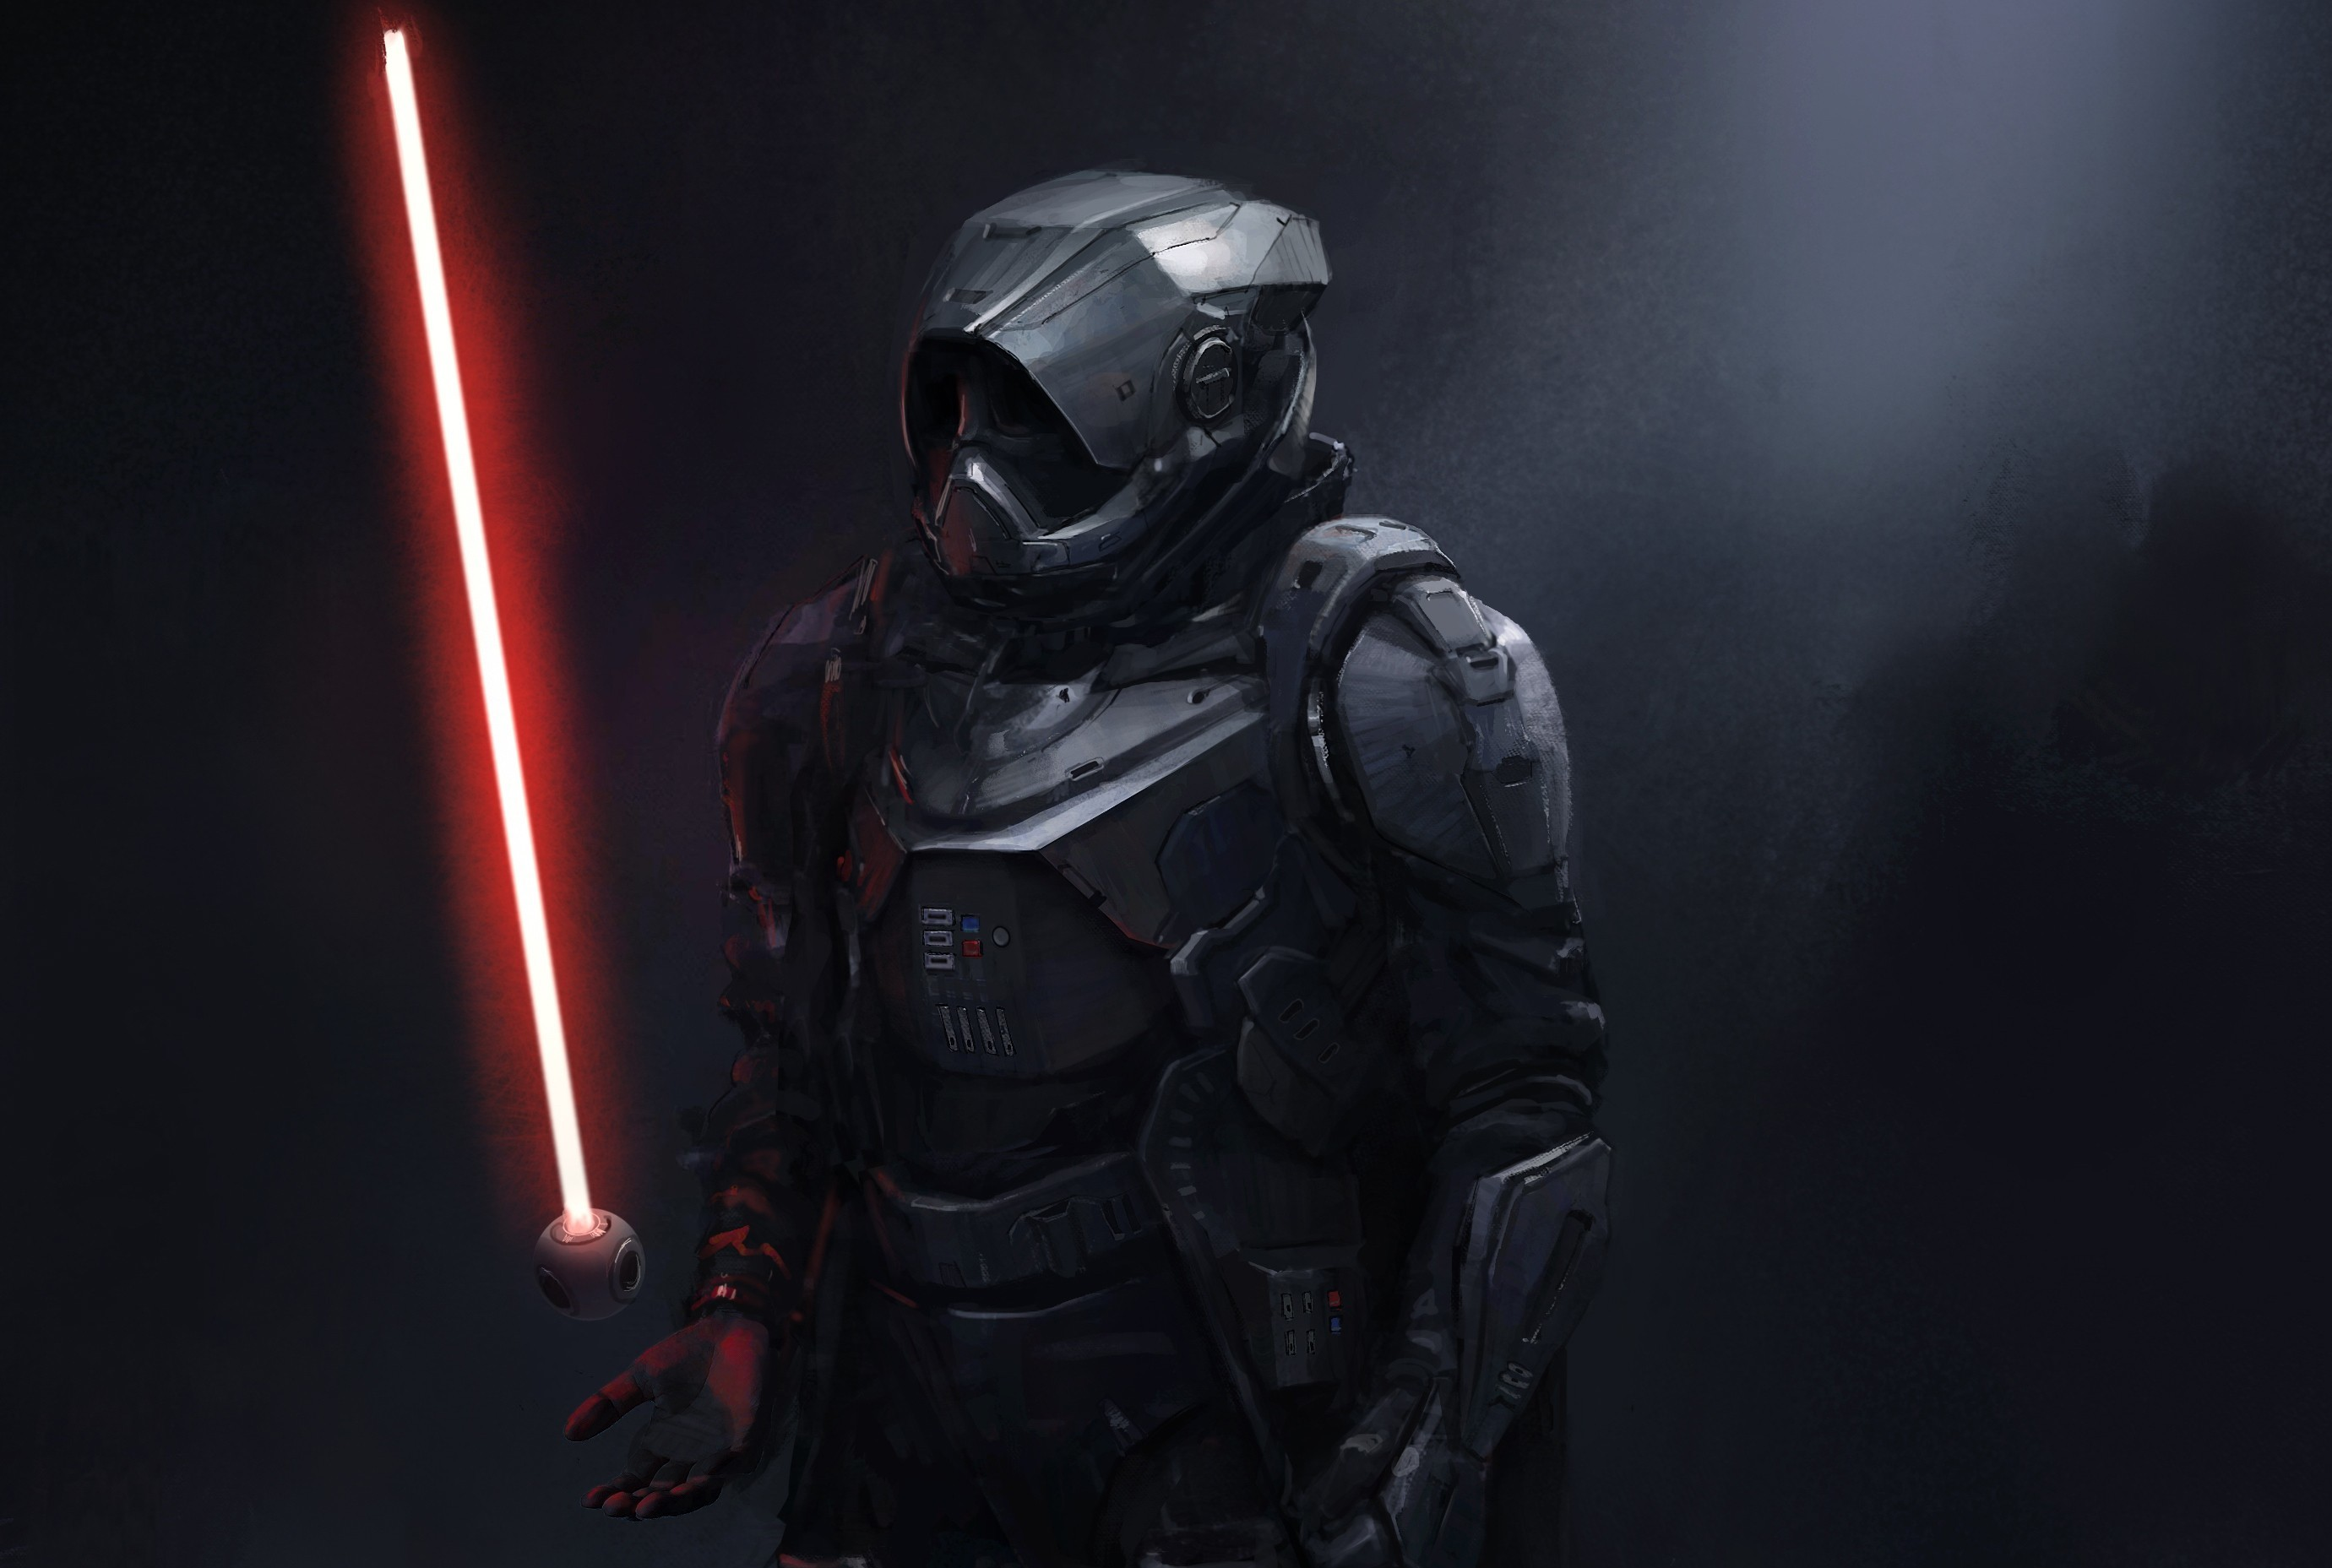 Sci Fi – Star Wars Sith (Star Wars) Lightsaber Red Wallpaper